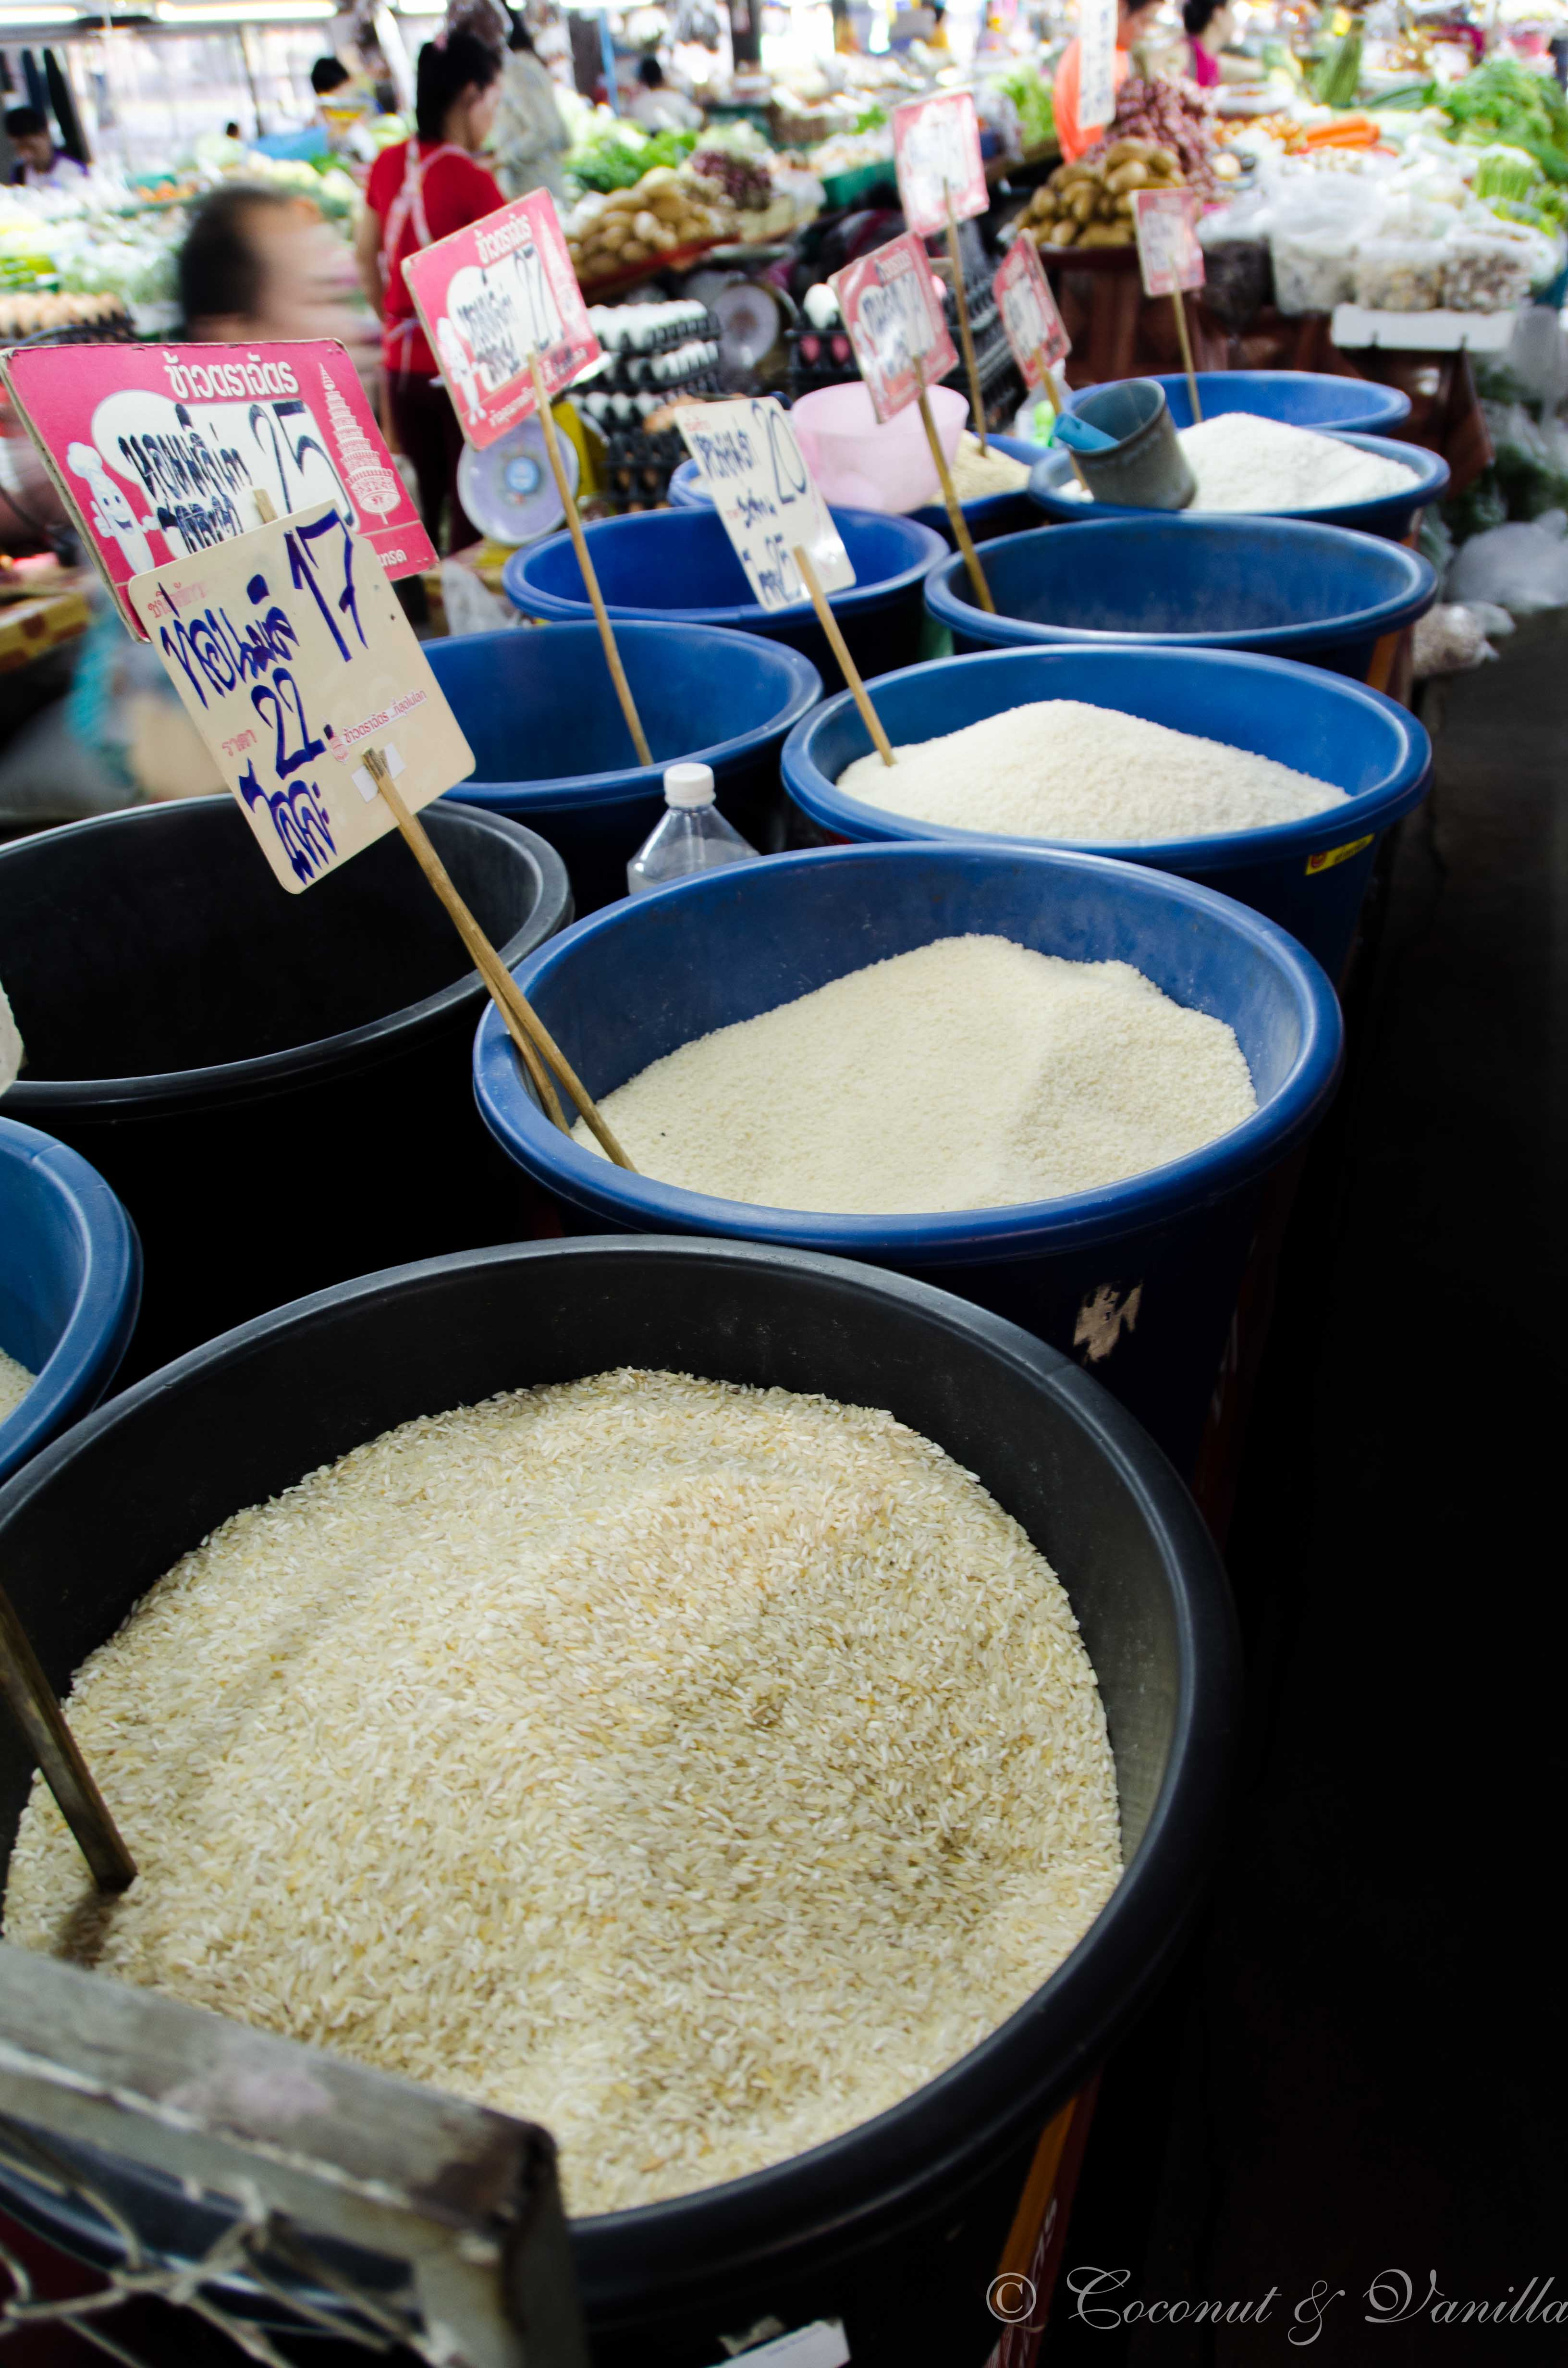 Markt in Chiang Mai Thailand: Reis ohne Ende, by Coconut & Vanilla